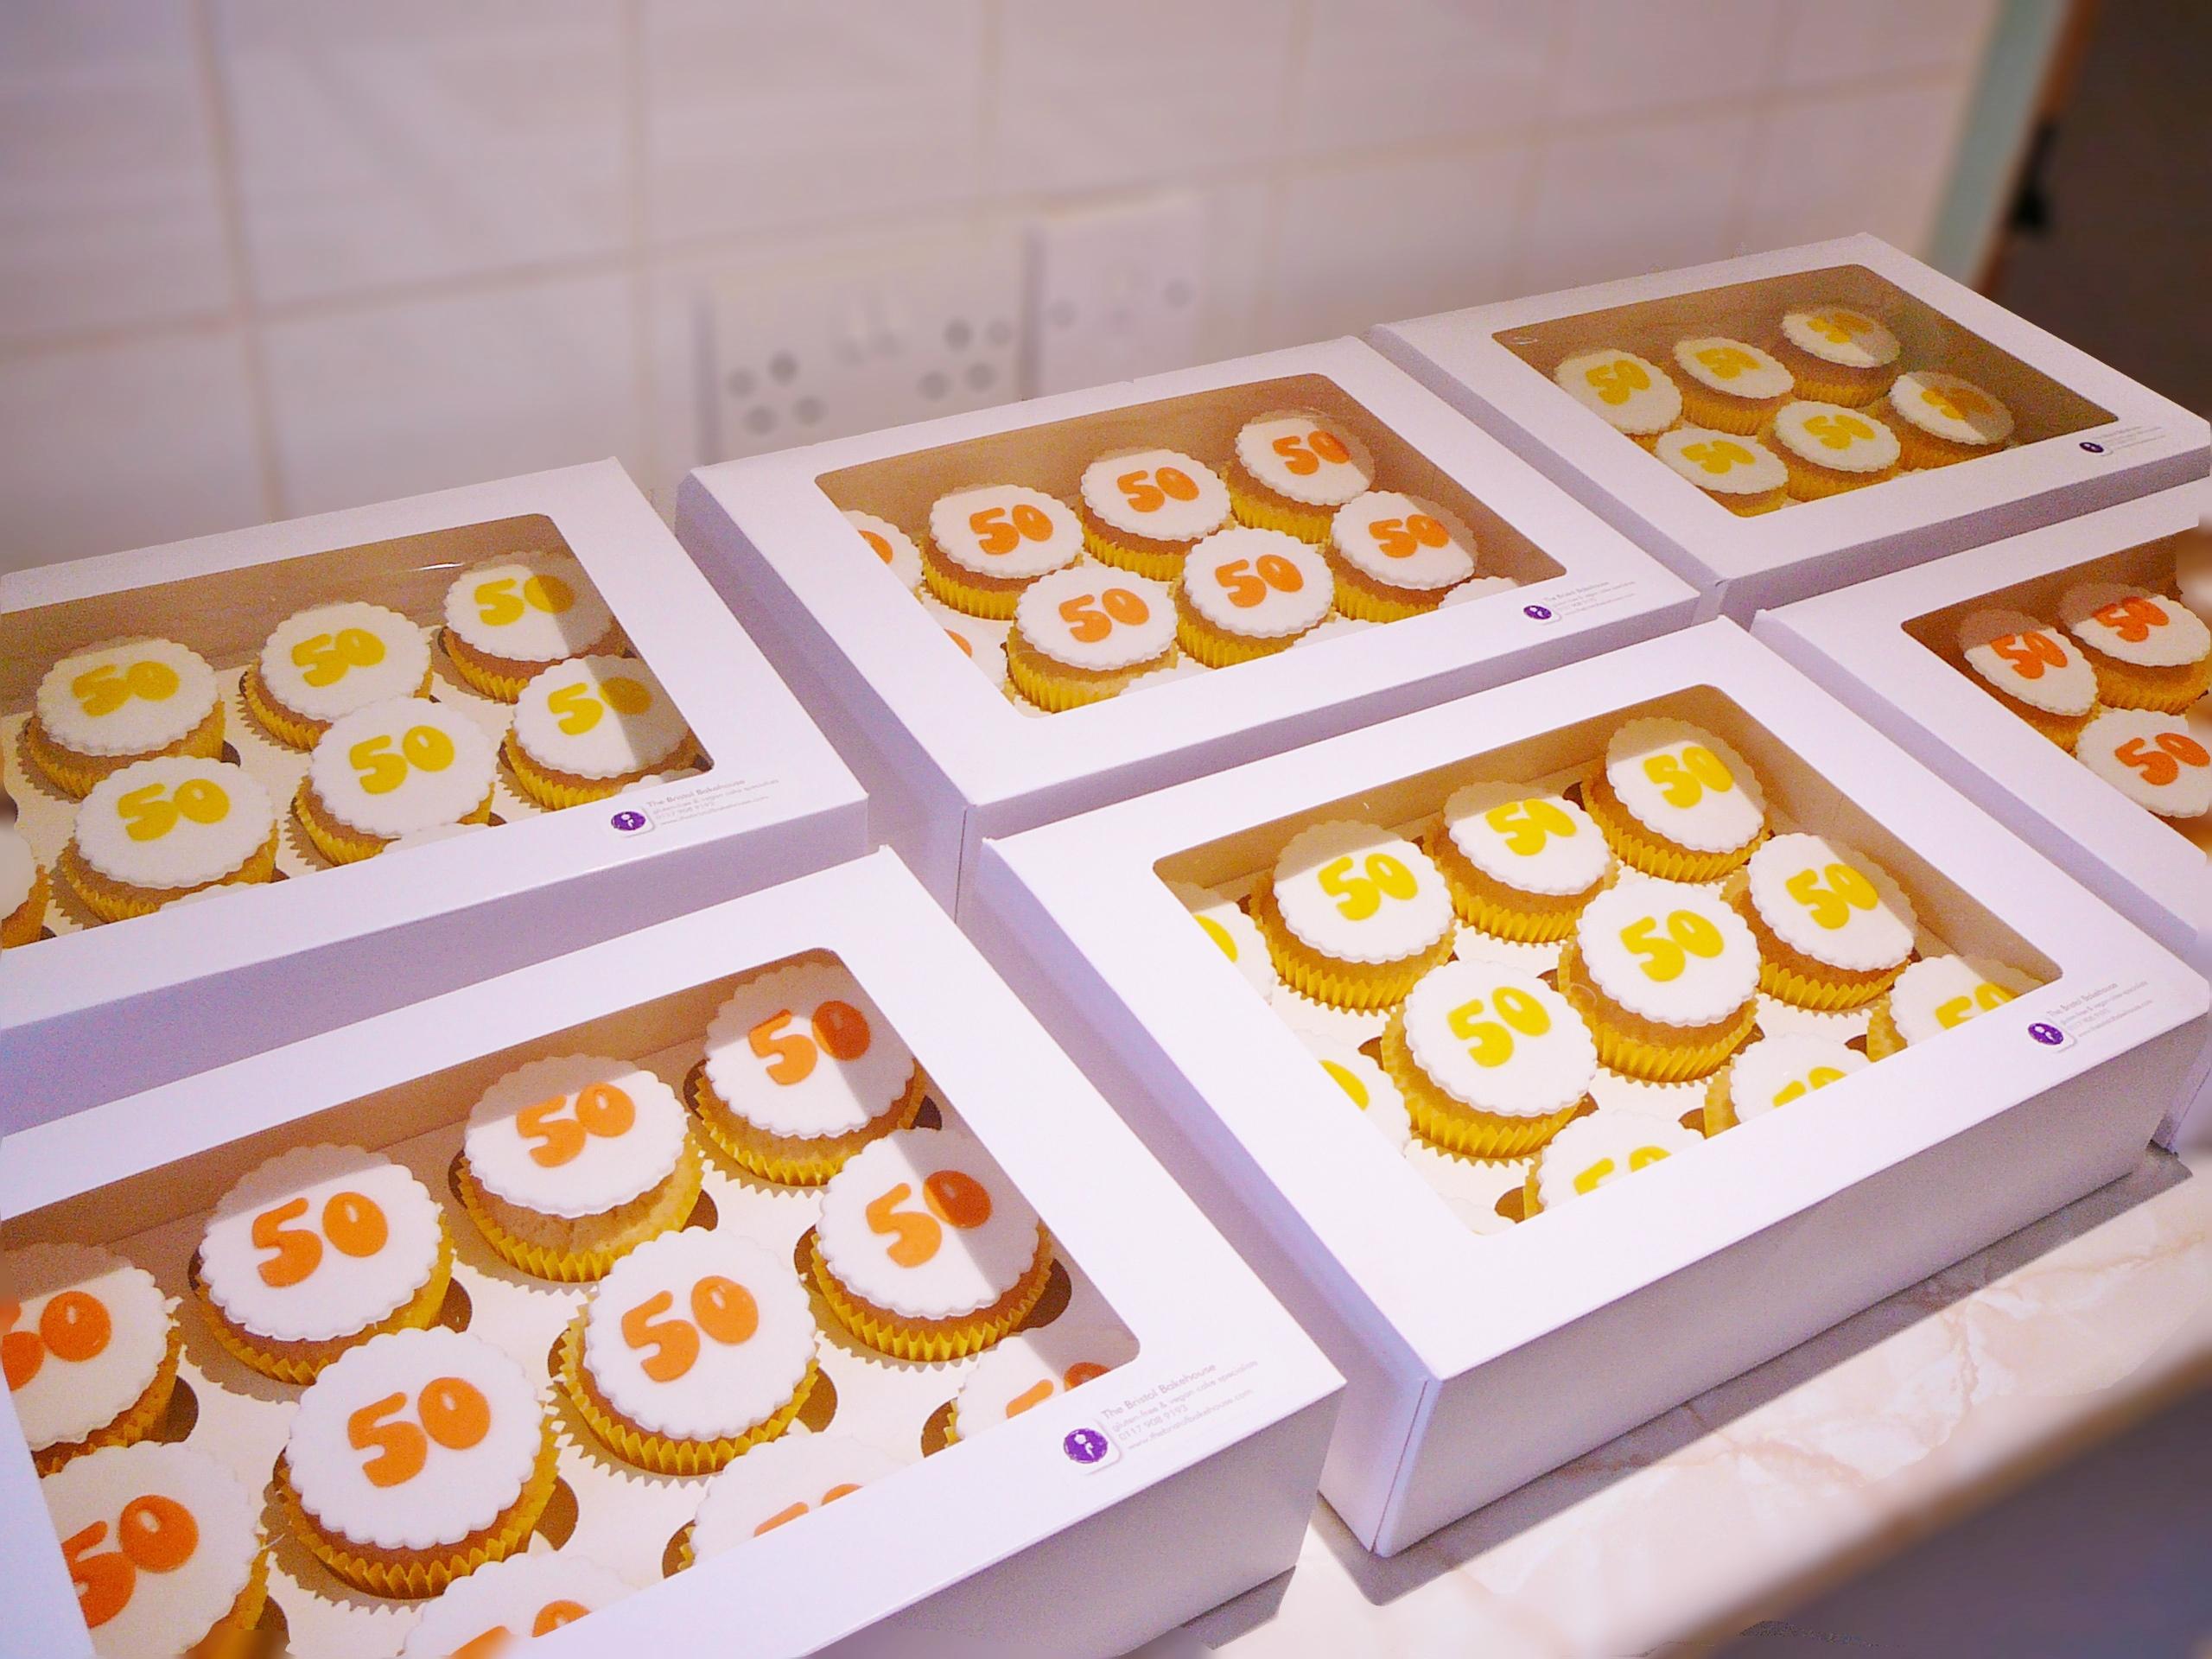 50th celebration cupcakes